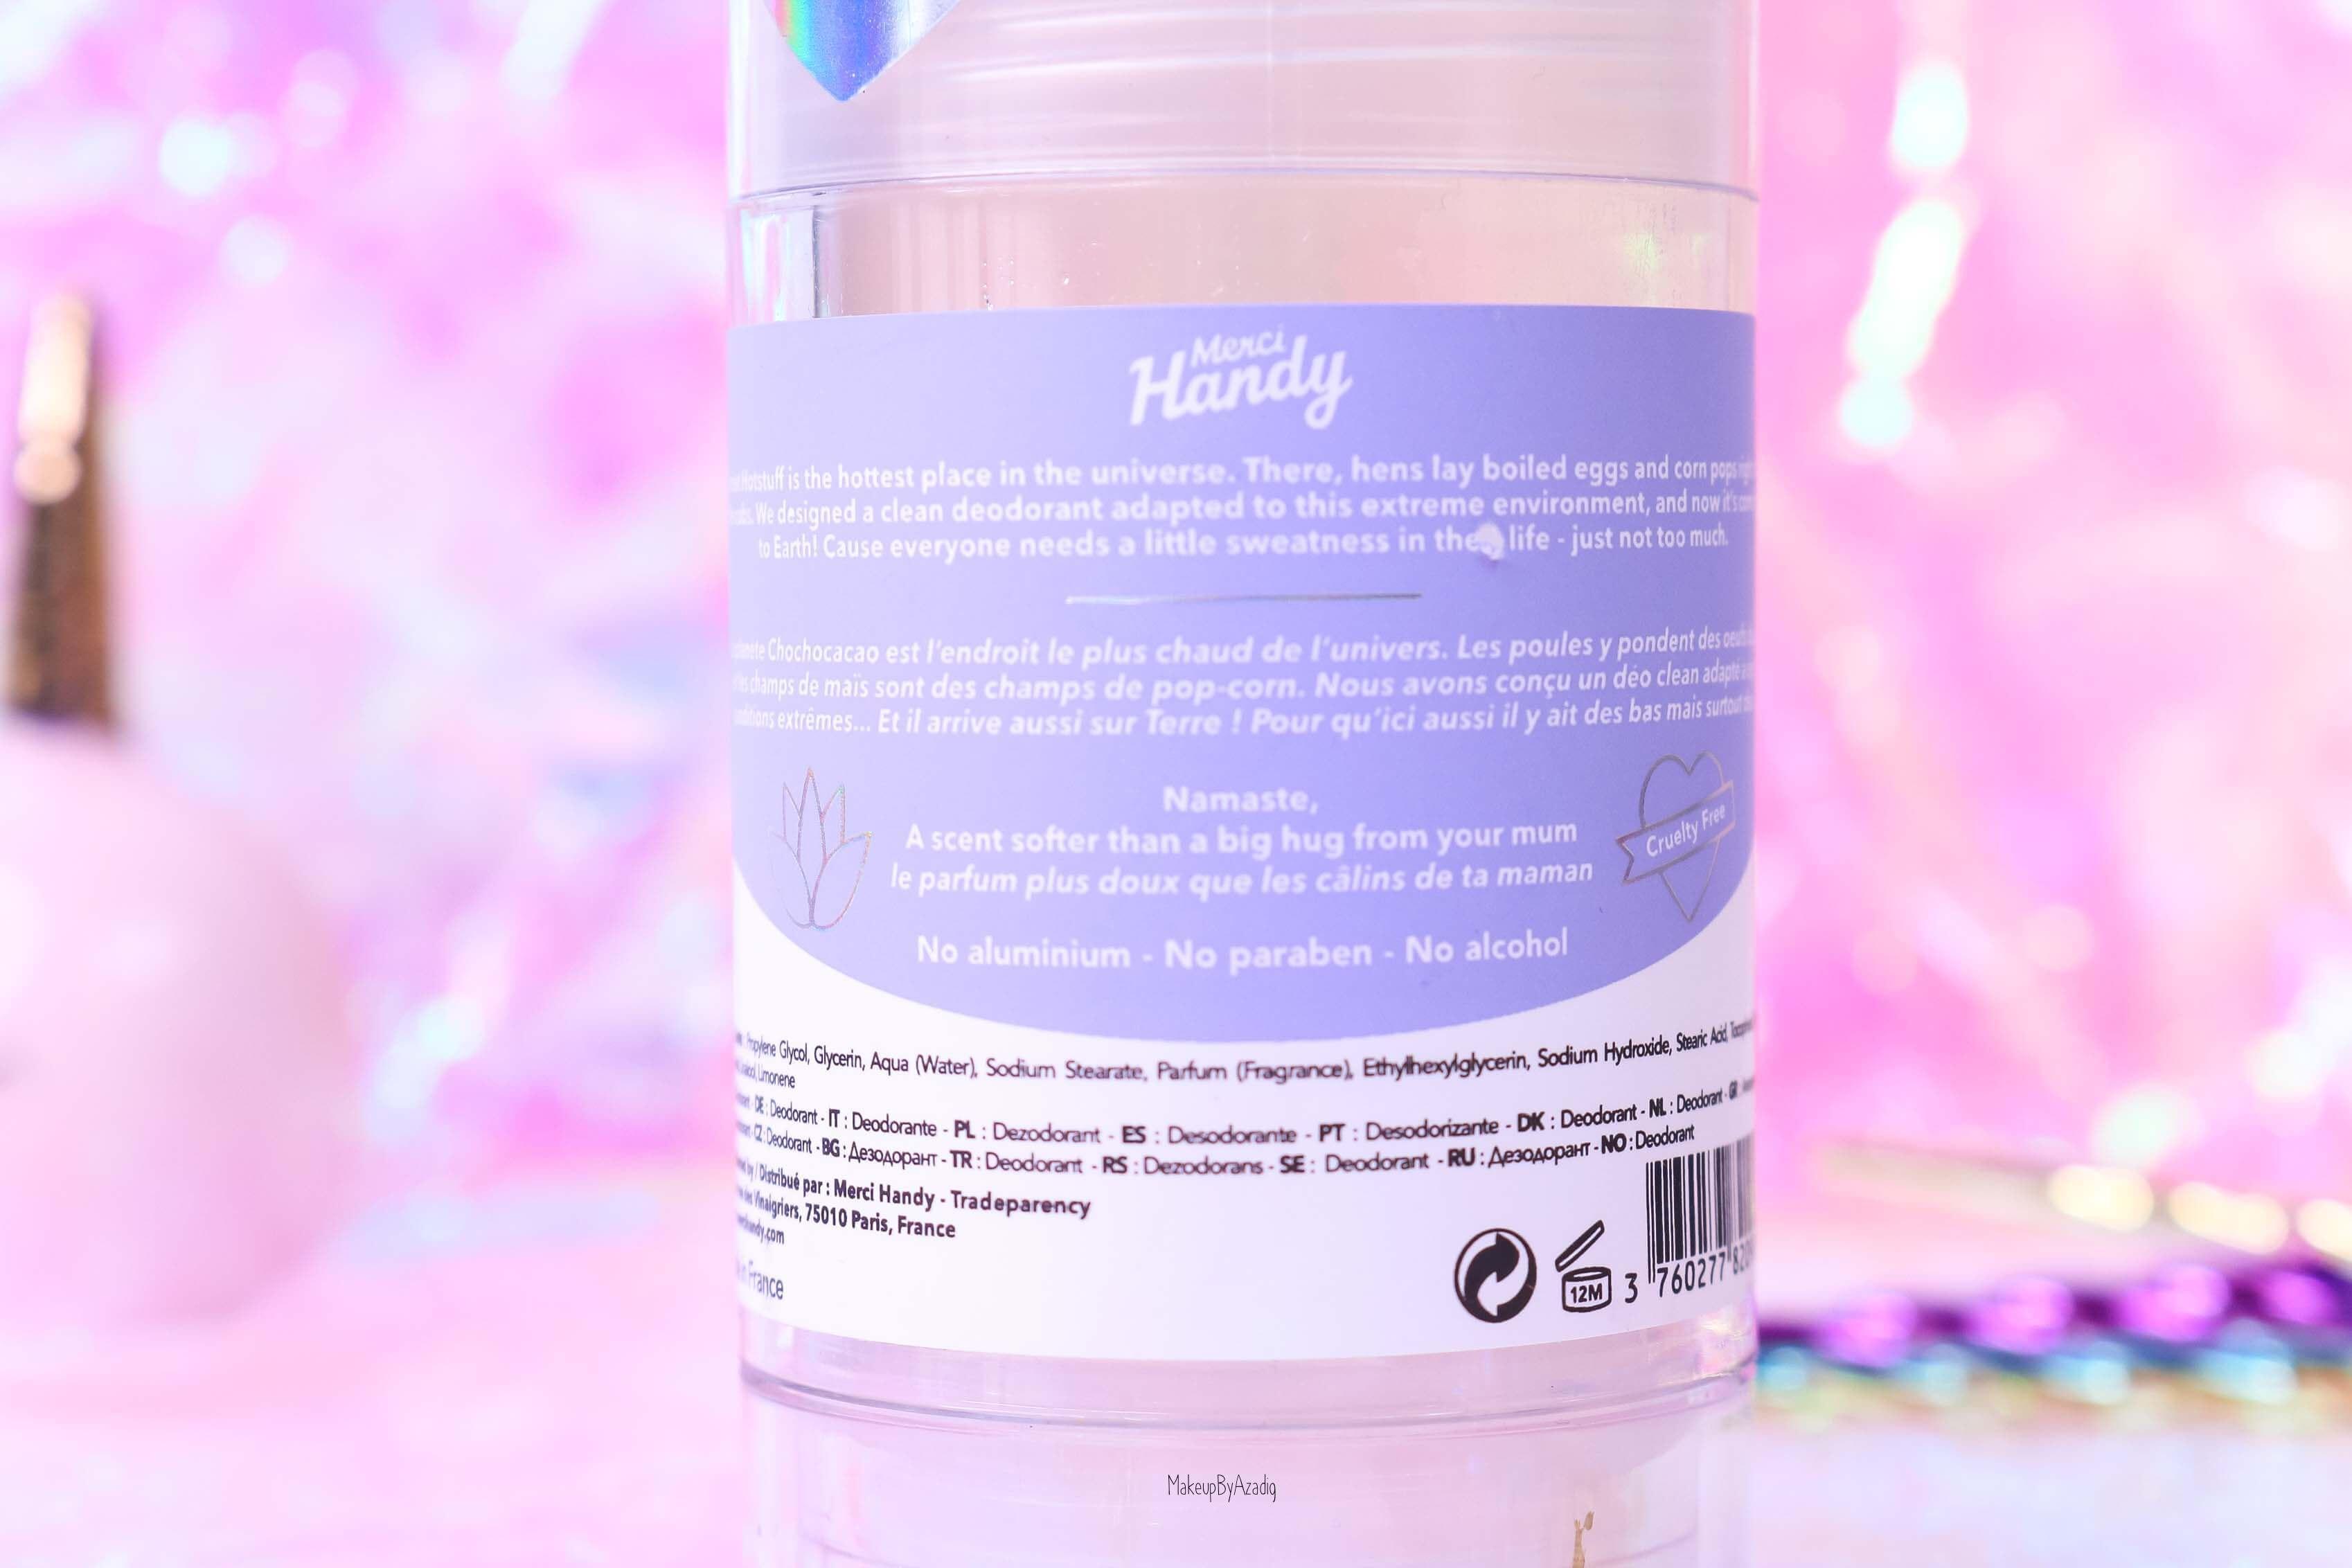 revue-clean-deodorant-merci-handy-namaste-flower-power-sans-aluminium-cruelty-free-avis-prix-makeupbyazadig-sephora-efficacite-violet